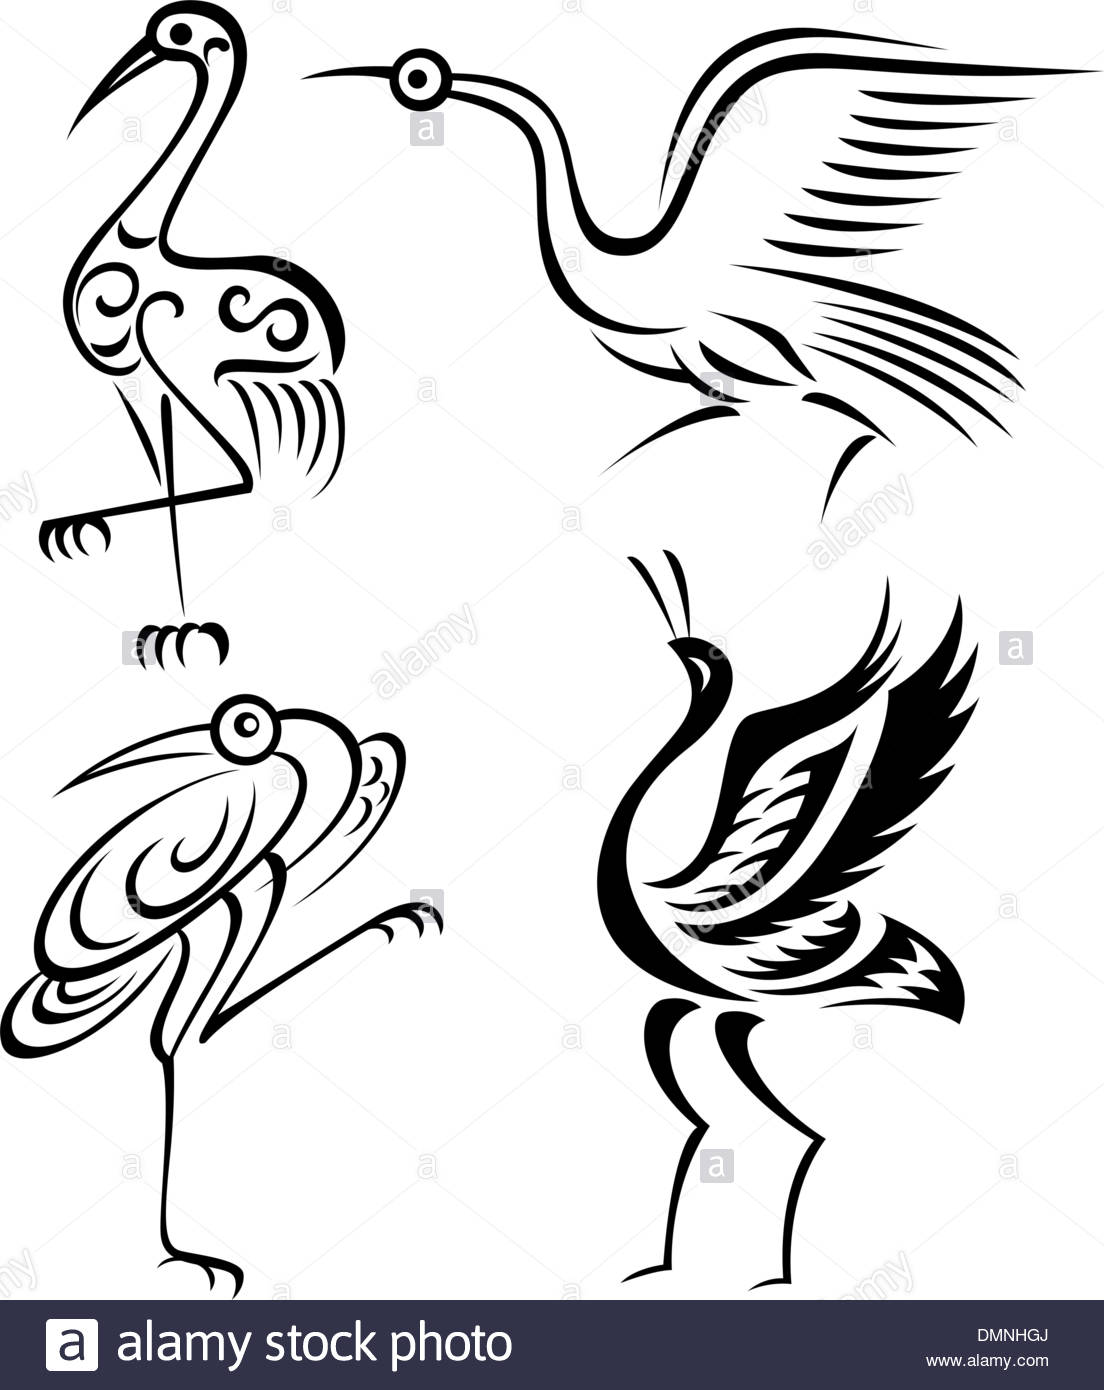 1104x1390 Abstract Crane Bird Tattoo Symbol Stock Vector Art Amp Illustration